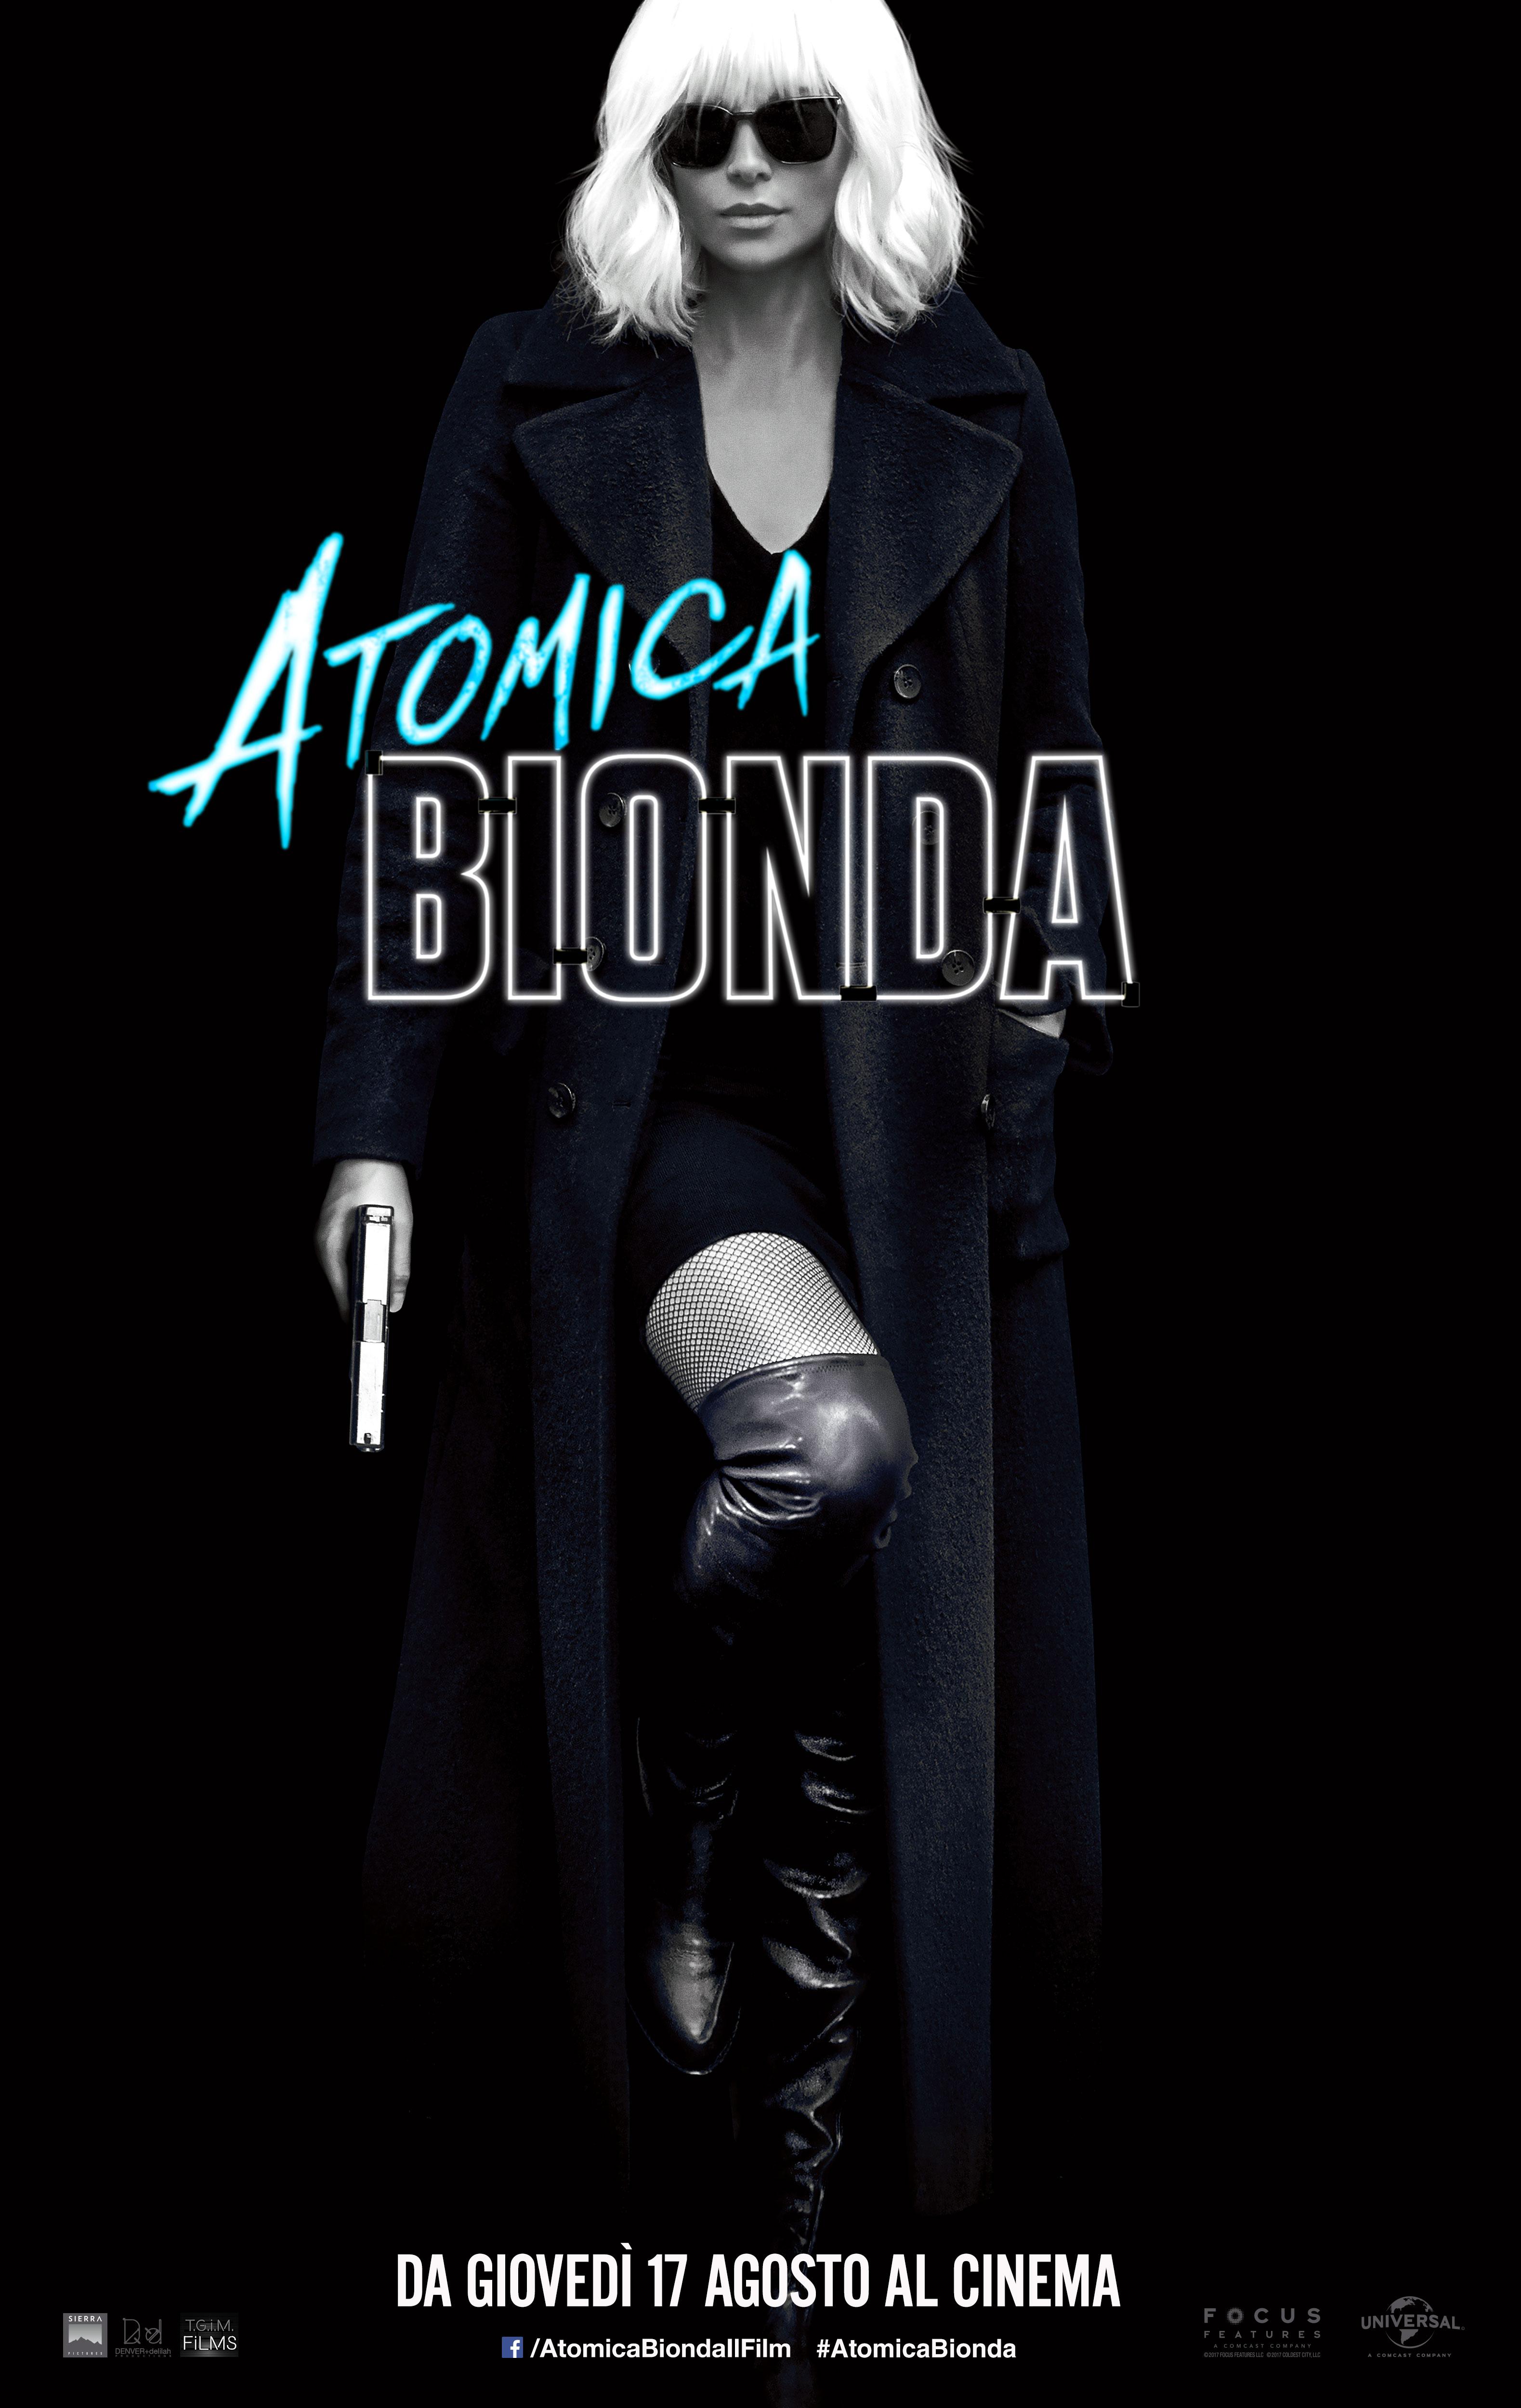 atomica bionda film streaming online viblix